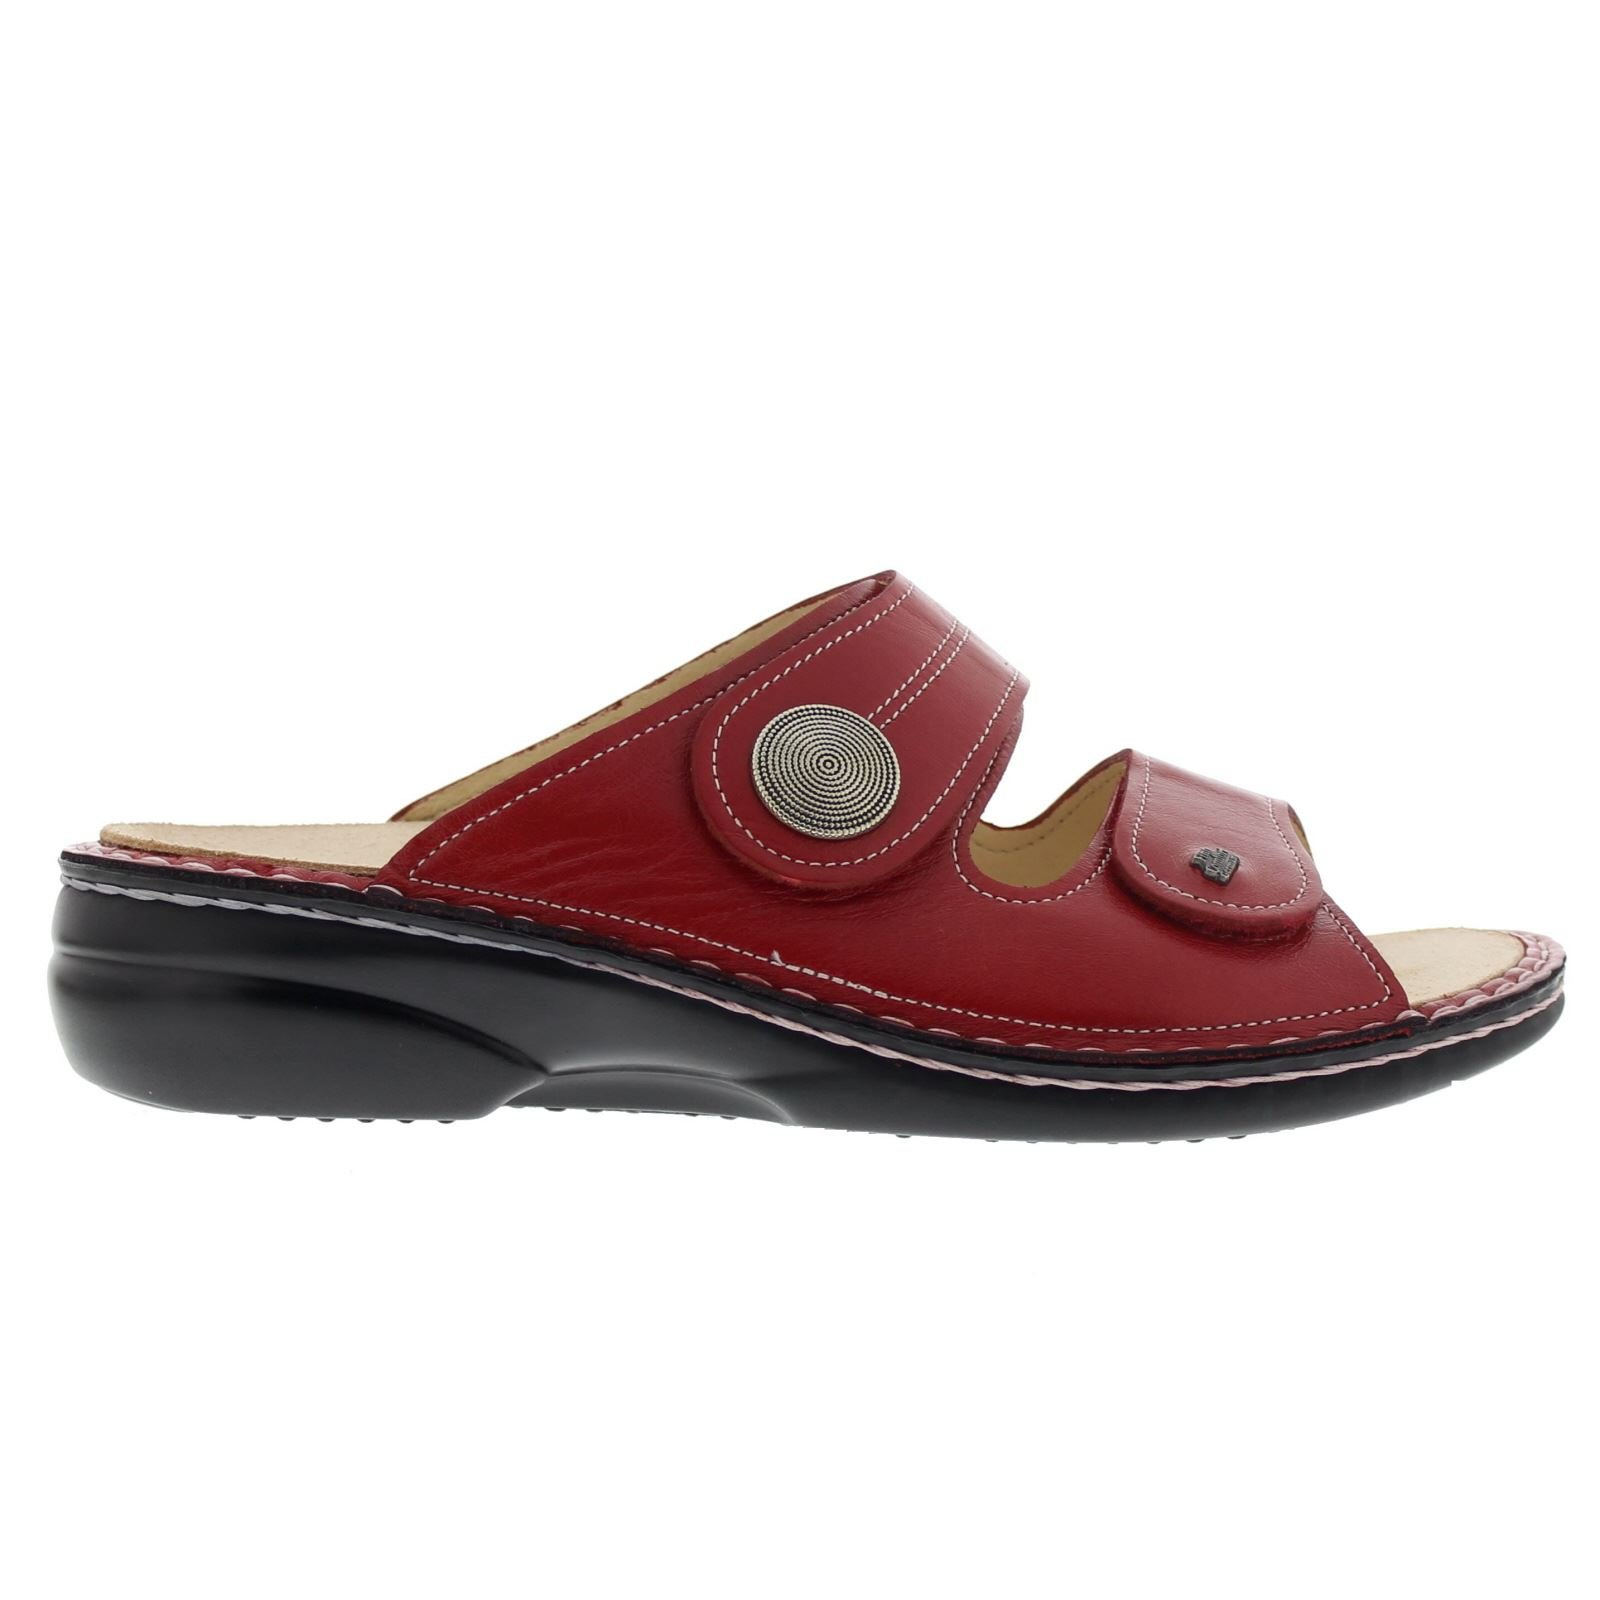 Finn Comfort Womens 2550 Sansibar Venezia Red Leather Sandals 40 EU